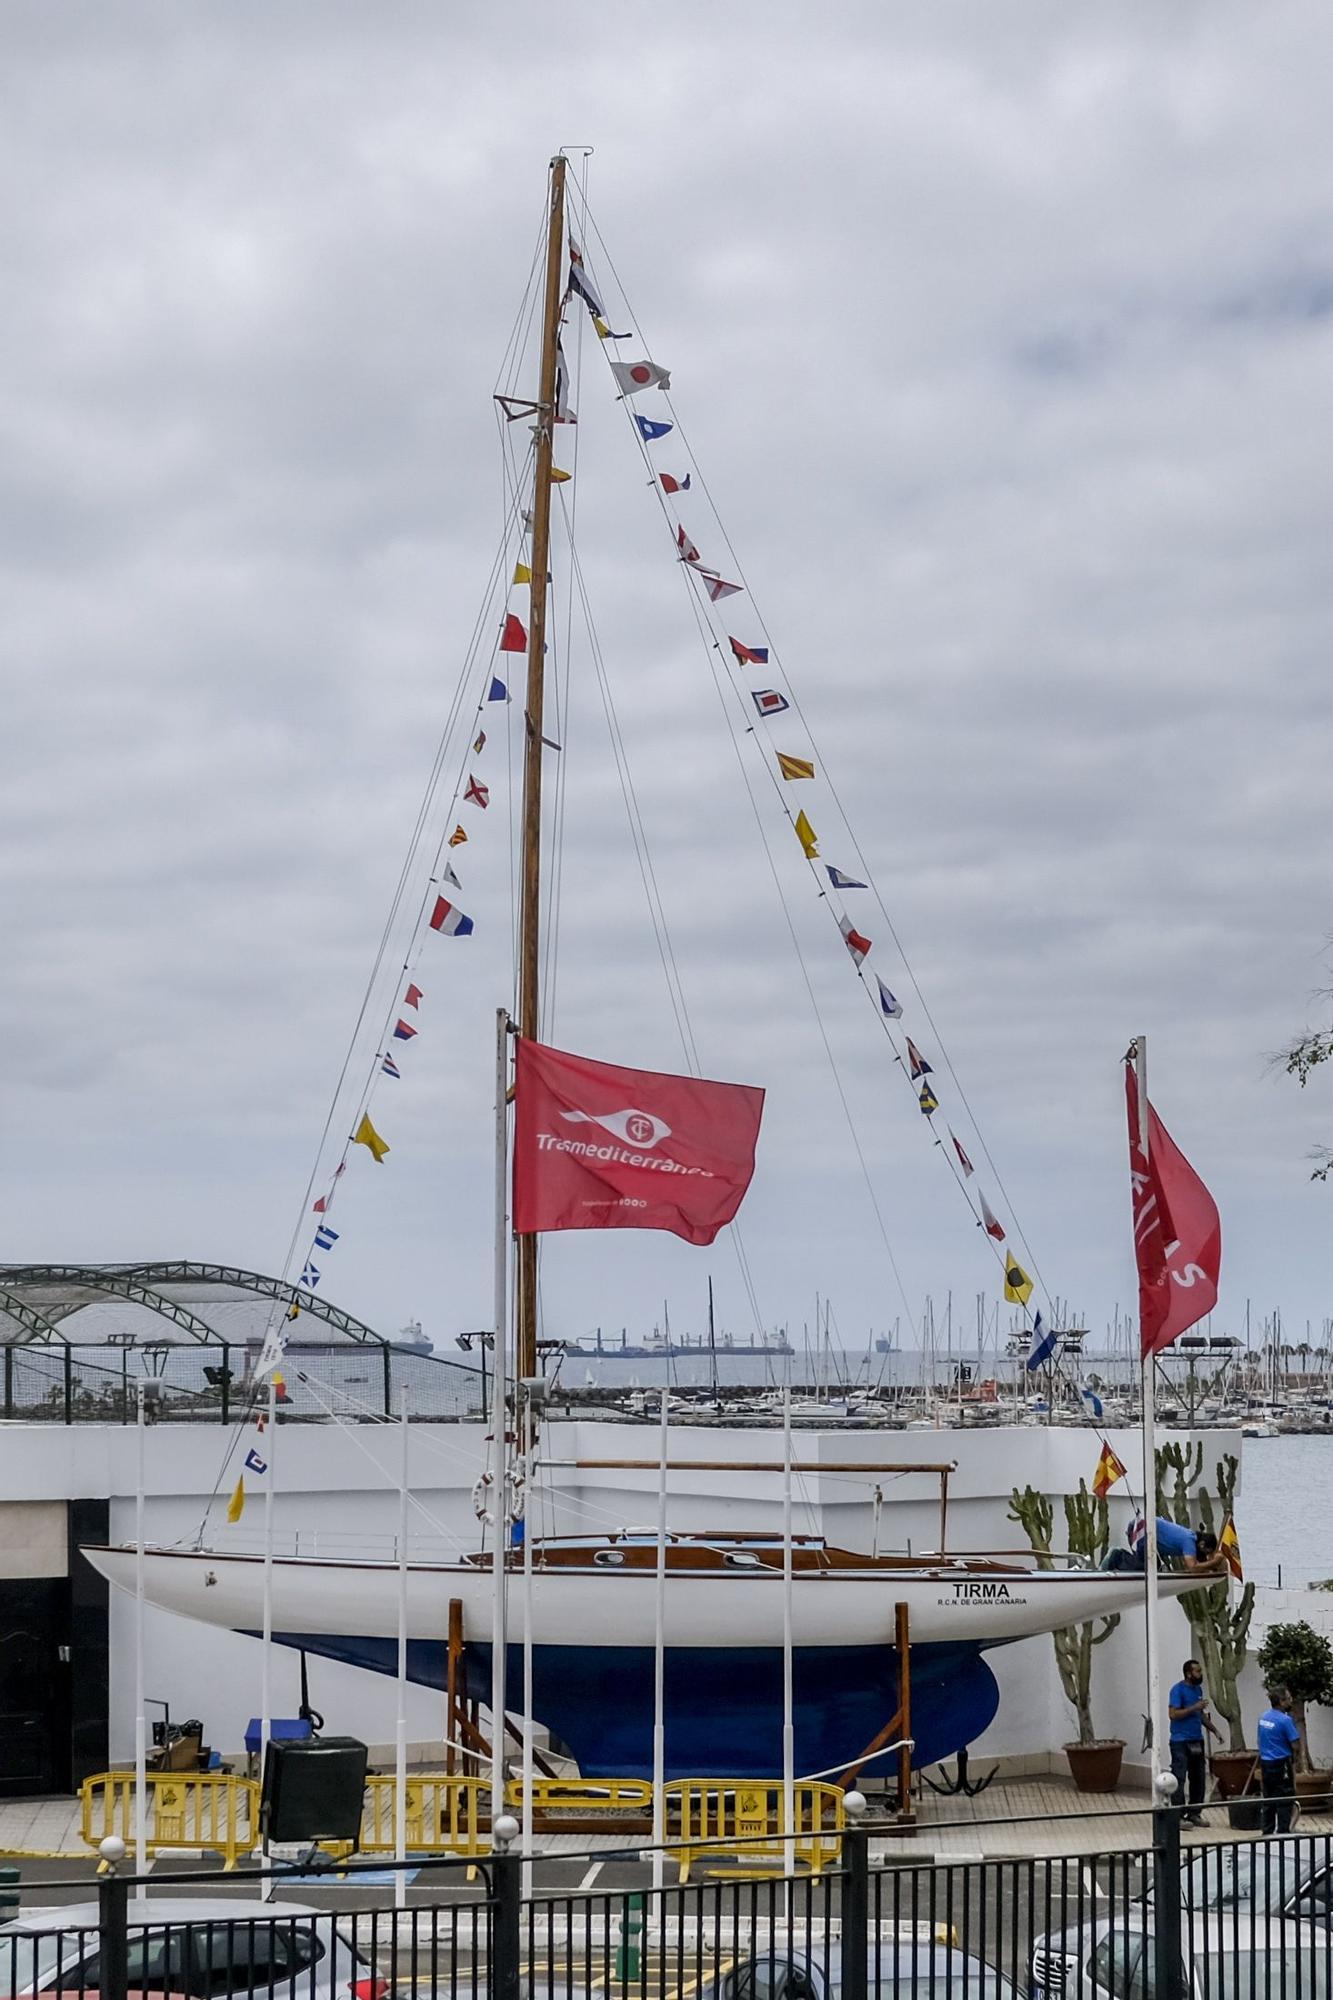 Restauración del barco Tirma